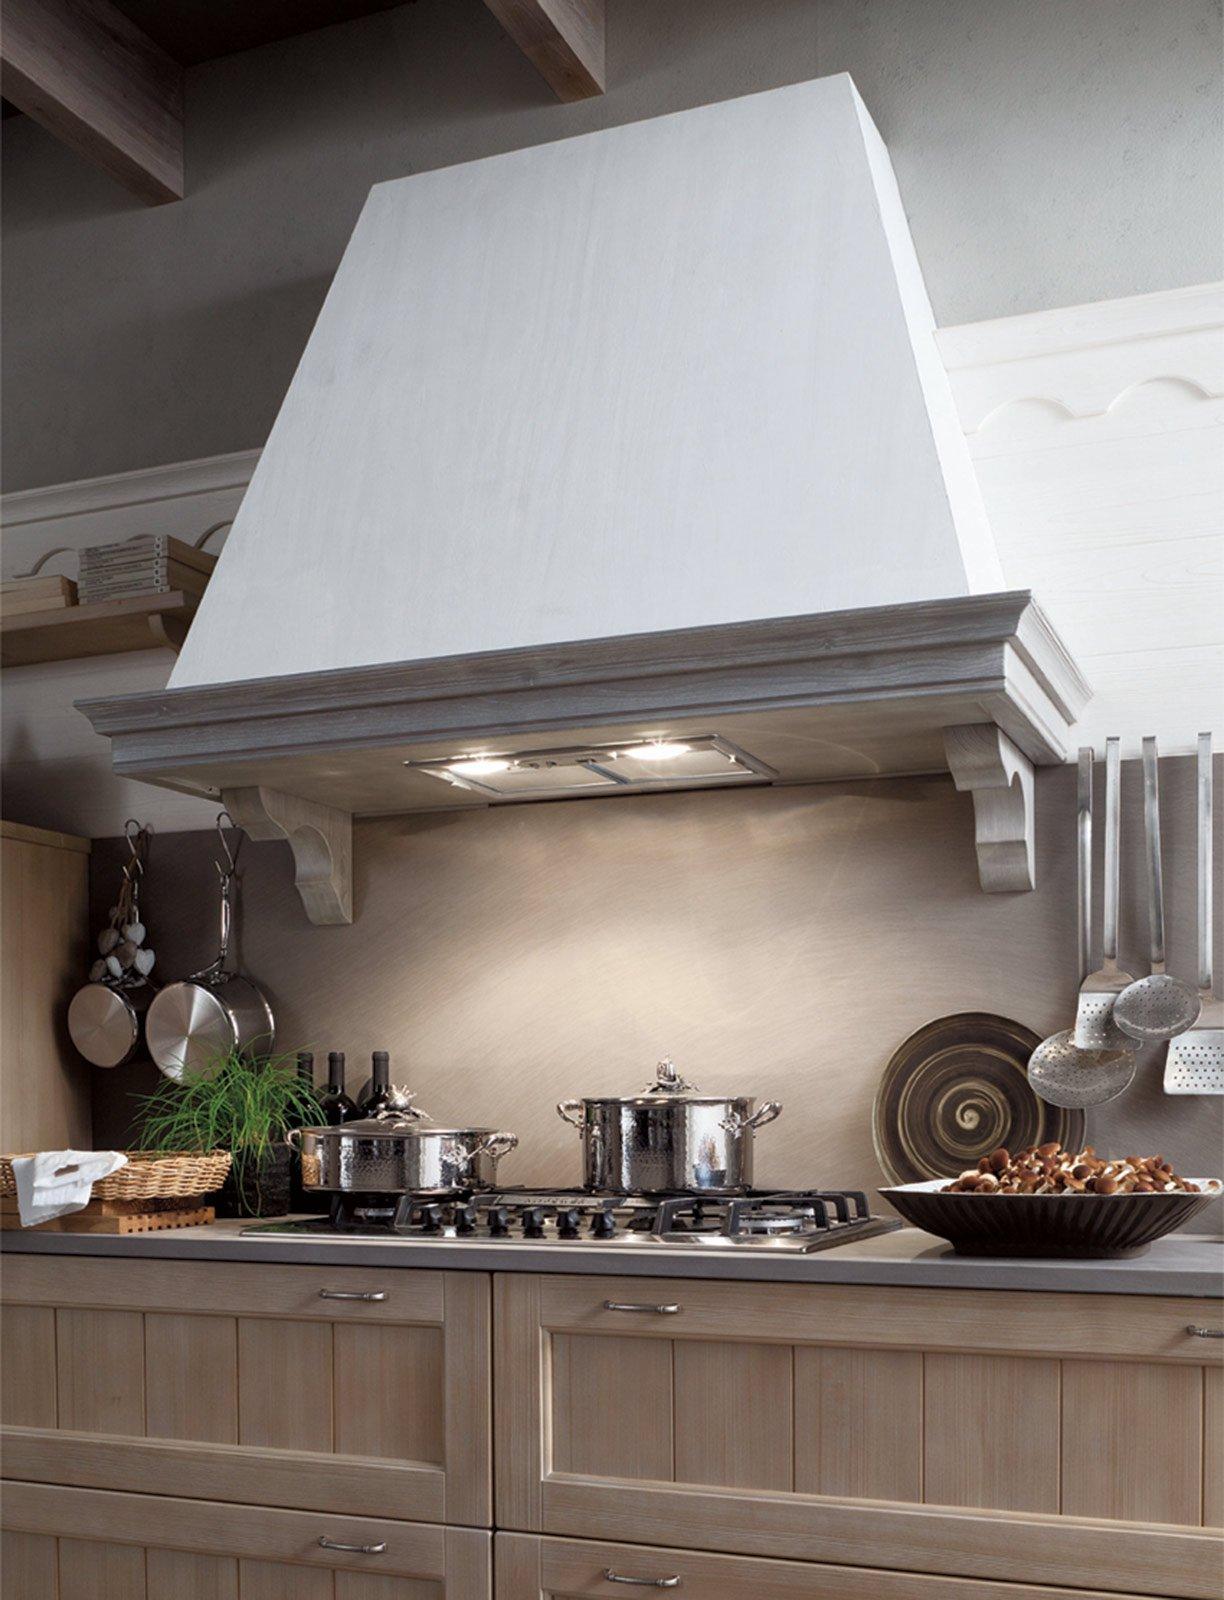 Cucina tante soluzioni per illuminarla cose di casa - Motore cappa aspirante cucina ...